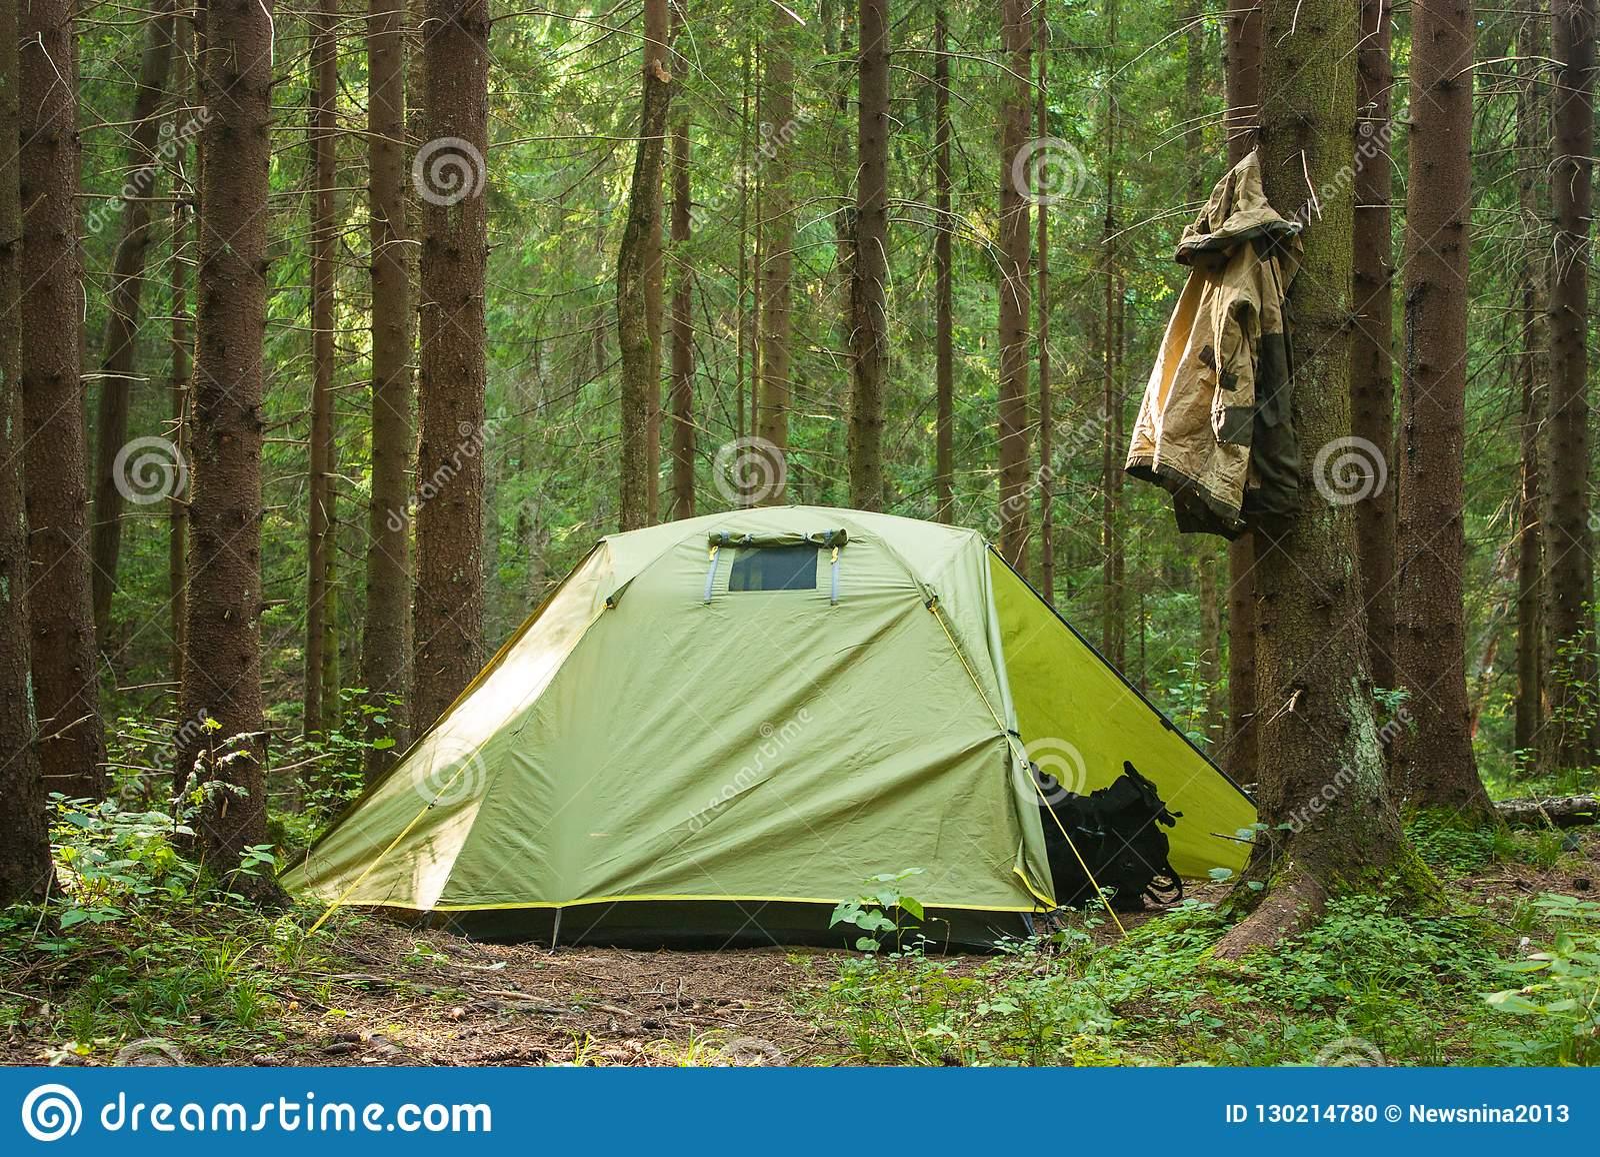 Kamping-Baum-Sommer-grüne Forest Nature Sun Happy Trip-Reise-Tasche